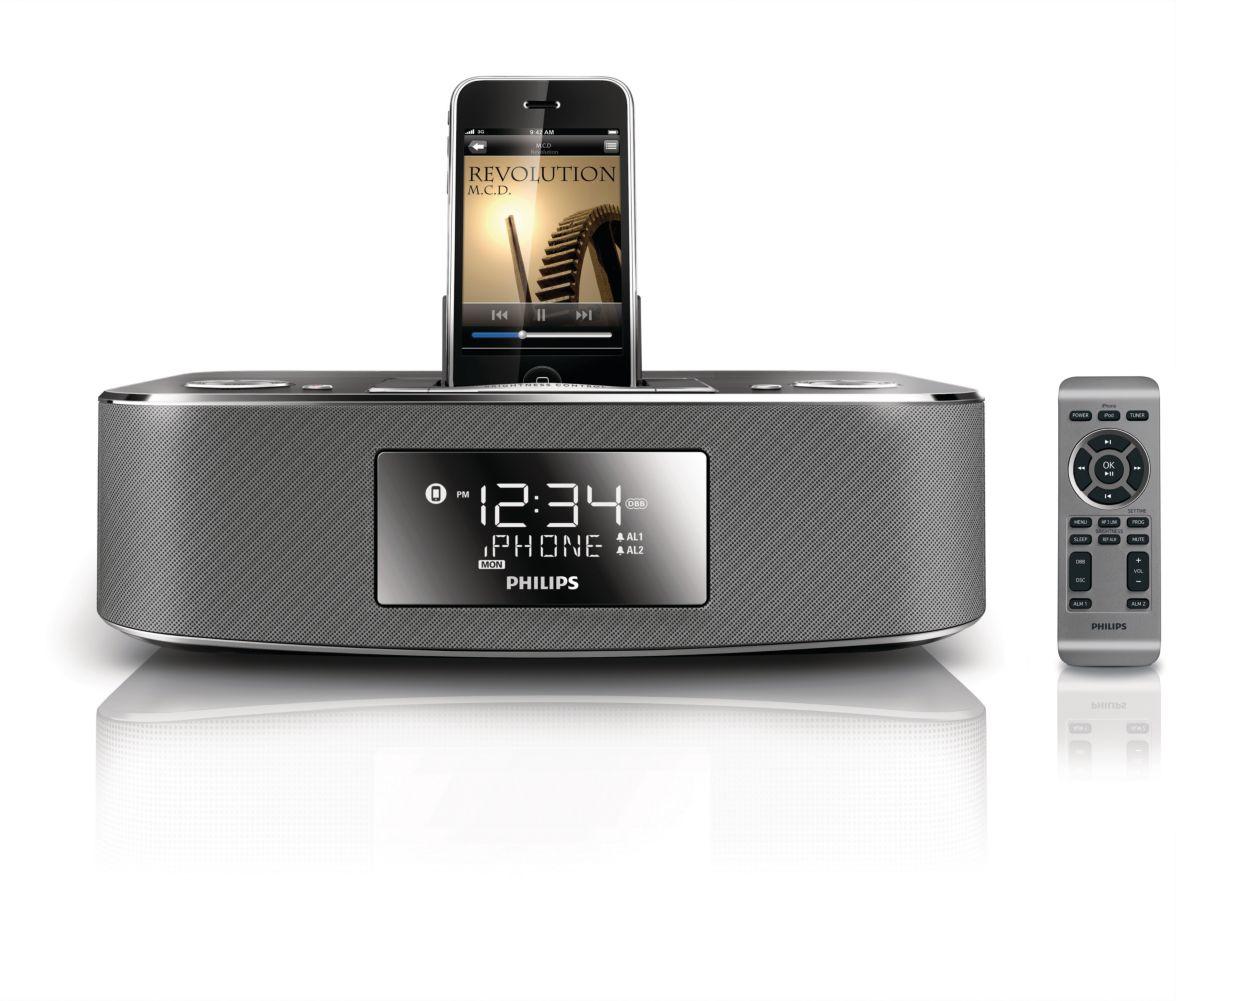 Bedroom phone clock radio